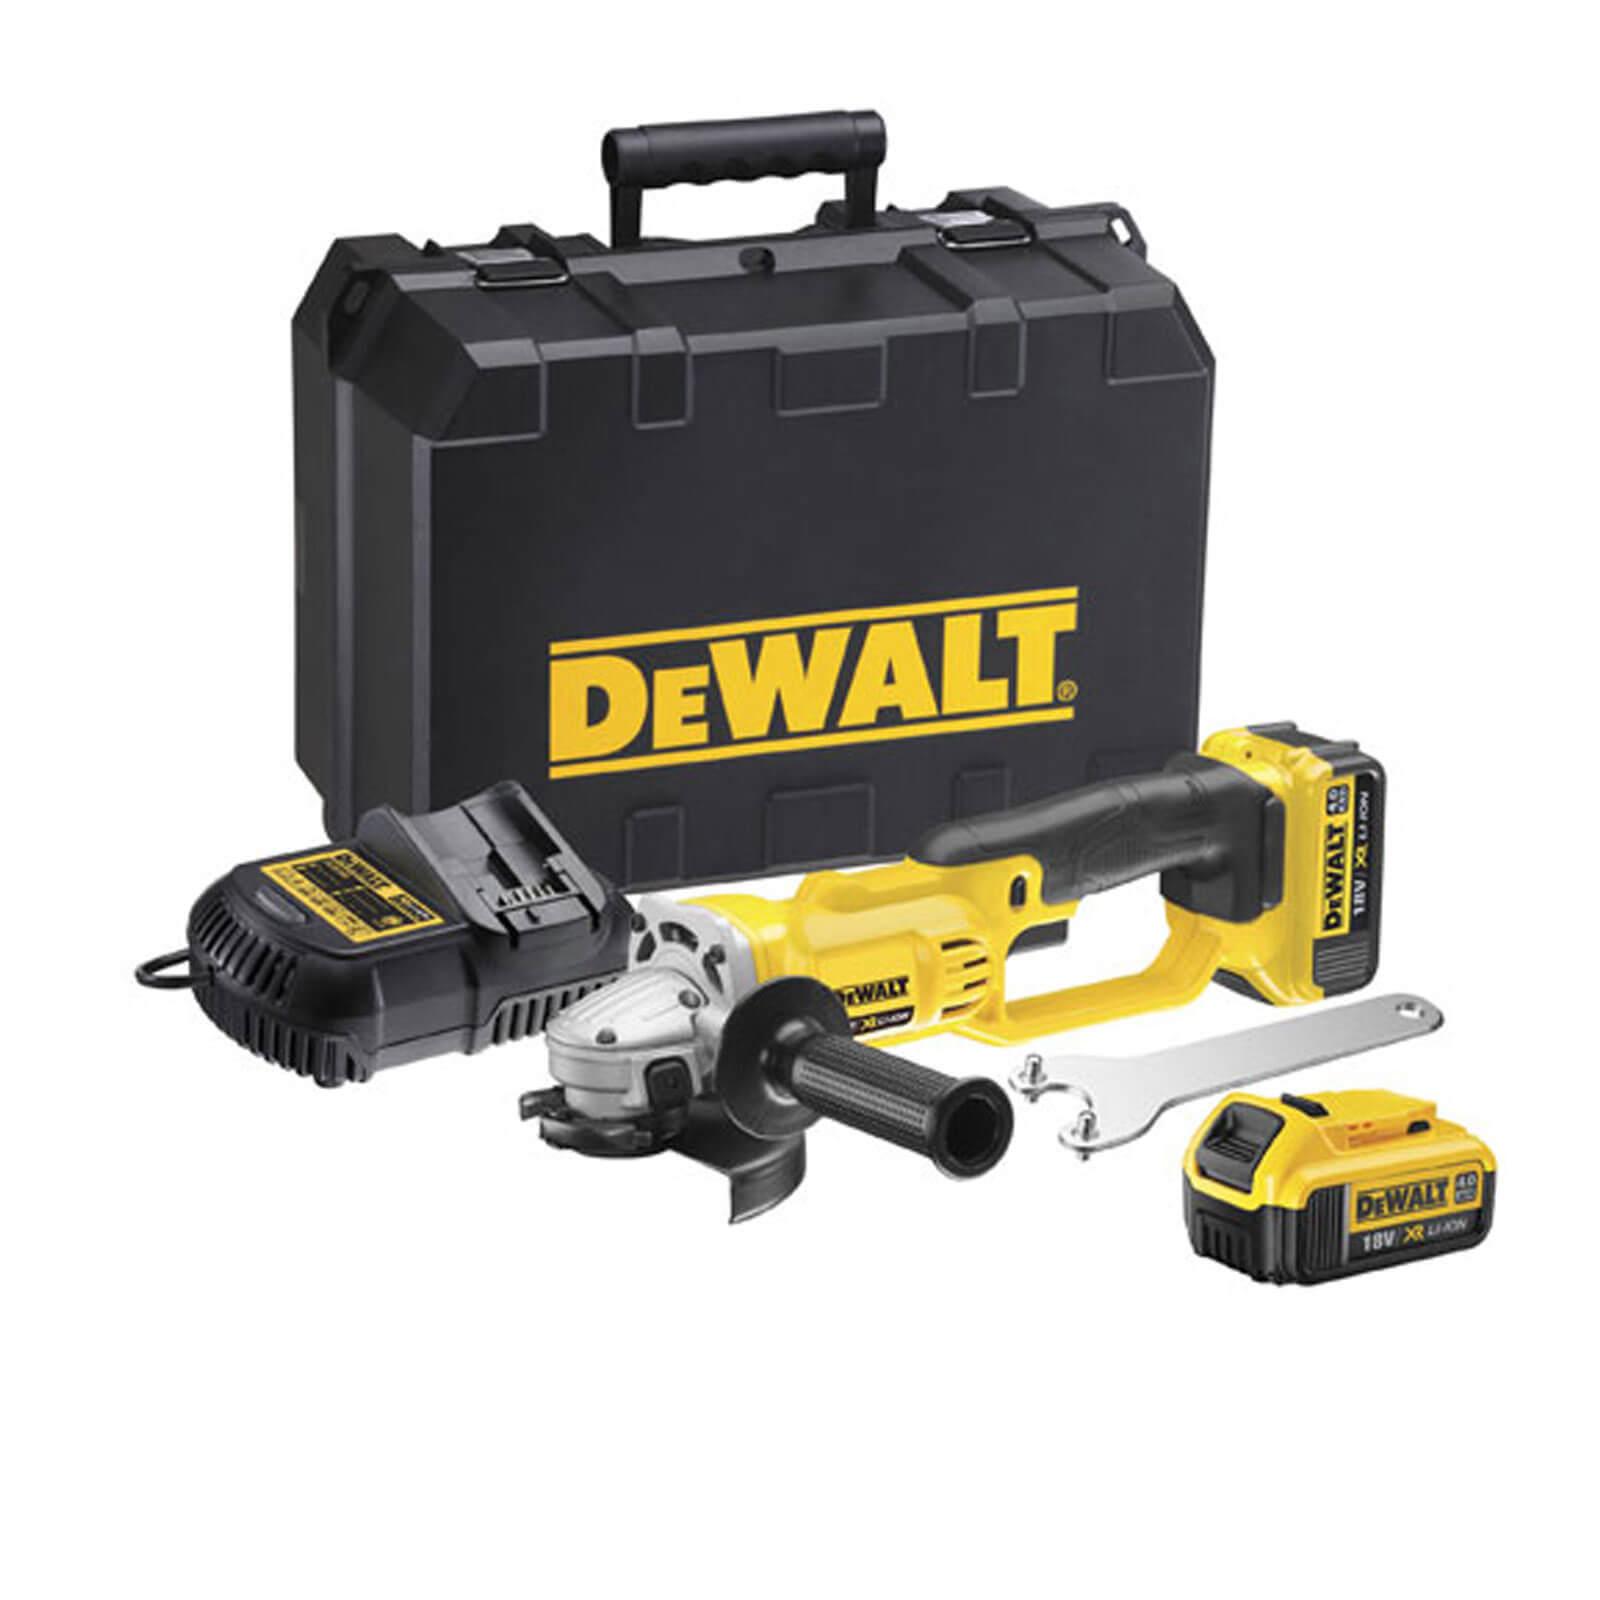 "DeWalt DCG412M2 18v Cordless XR Premium Angle Grinder 125mm / 5"" Disc with 2 Li-ion Batteries 4ah"